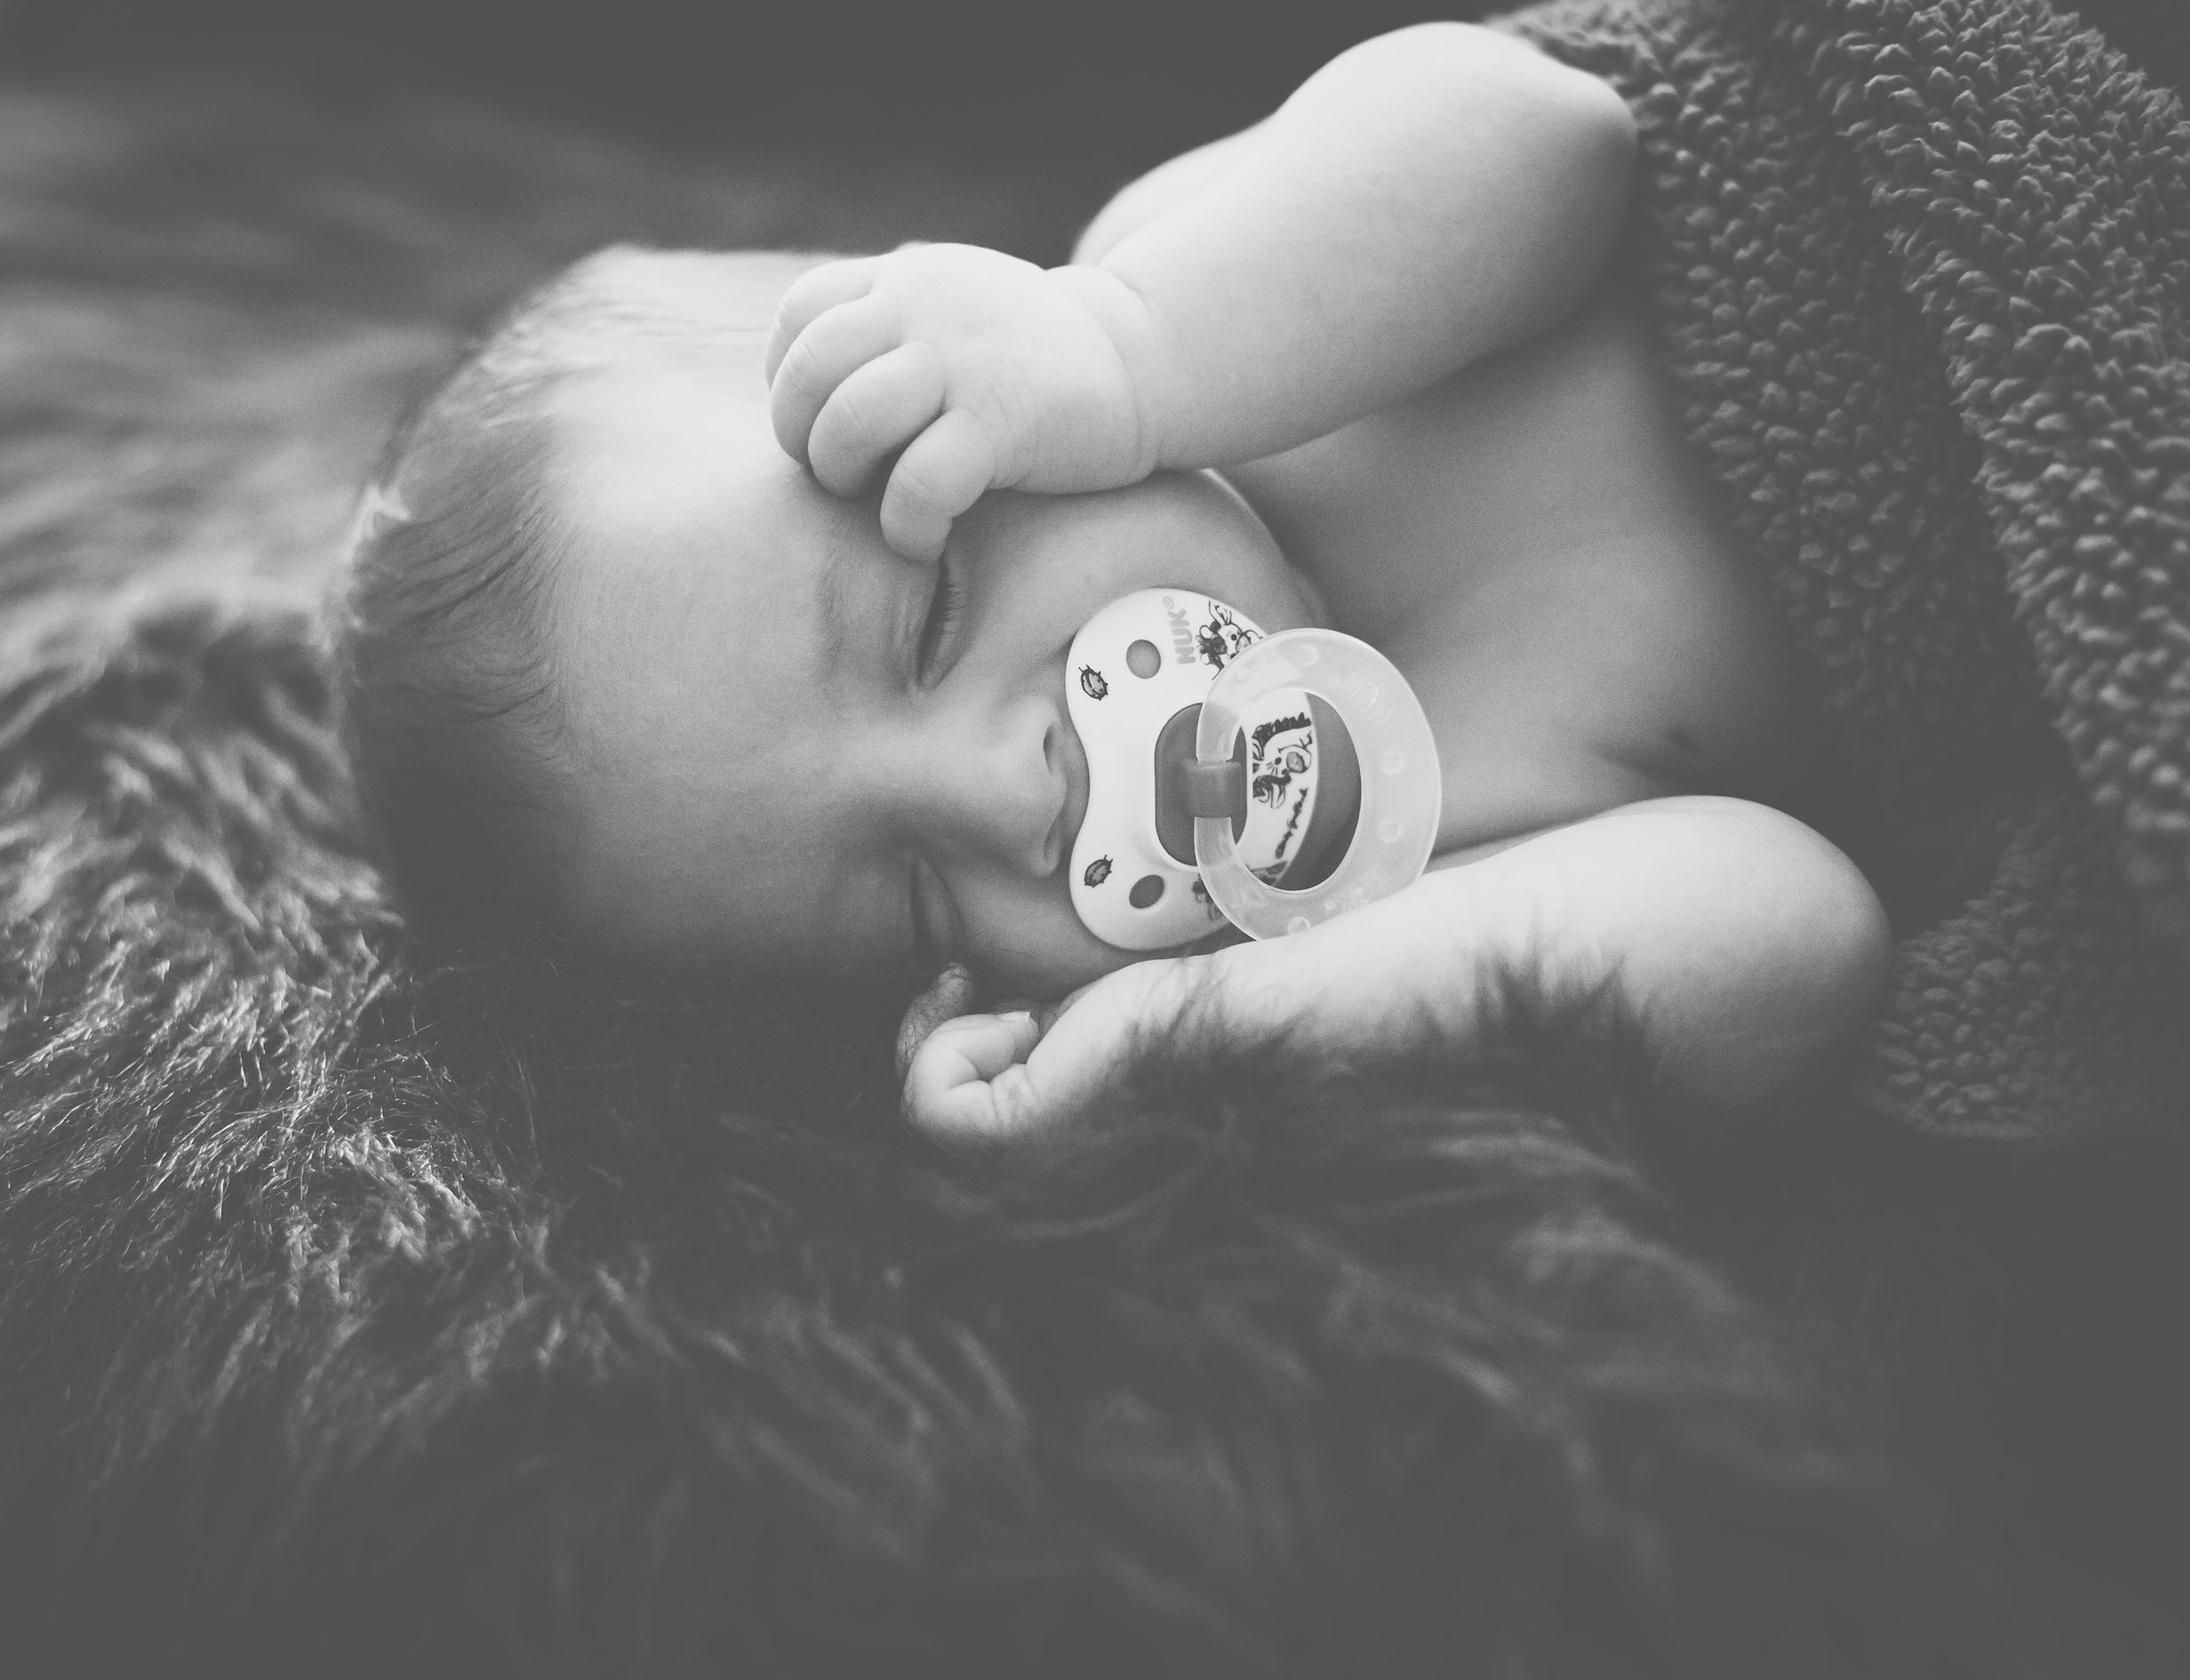 sweet dreams baby L.........